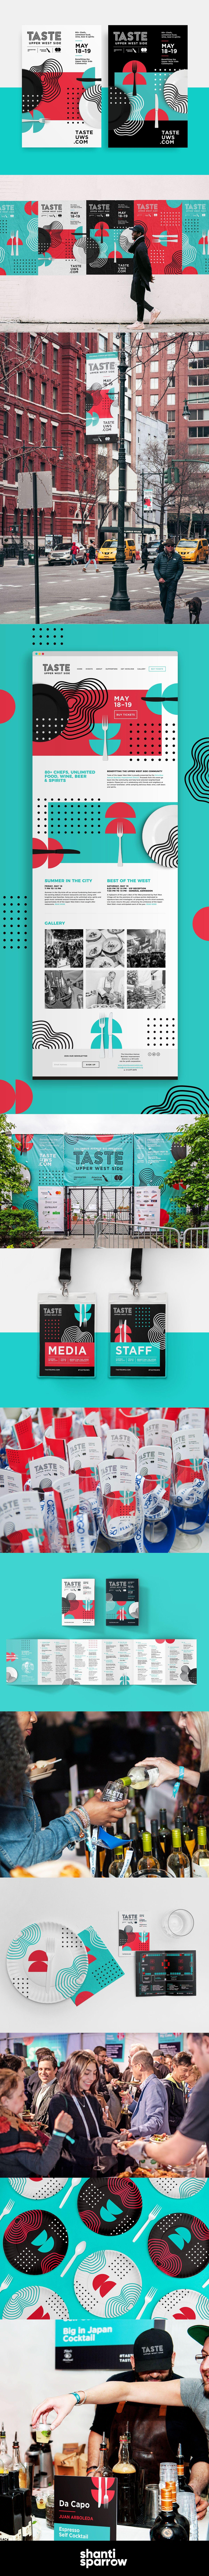 Shanti-Sparrow-Design-Branding-Inspiration